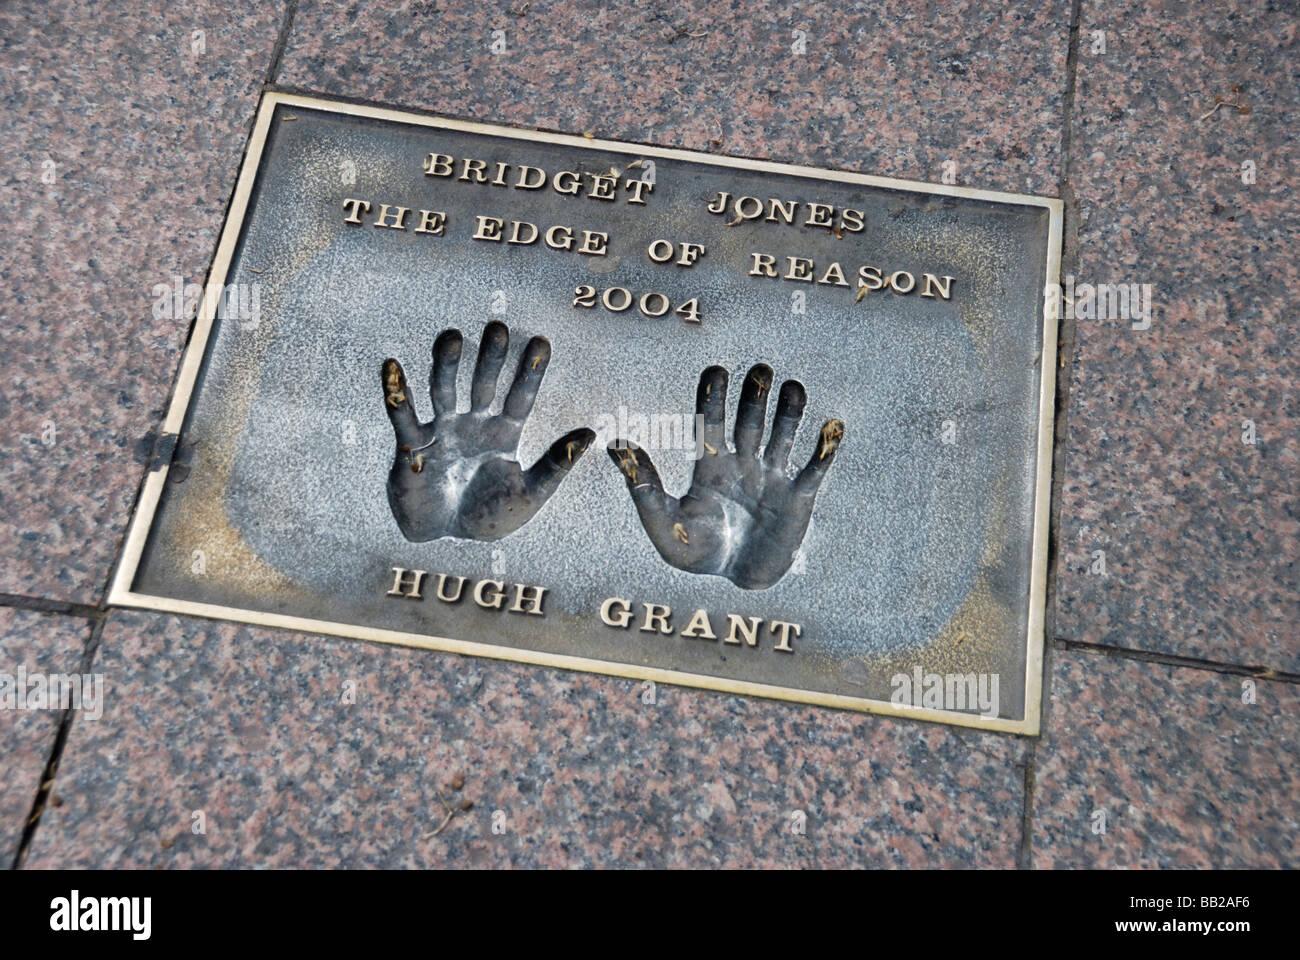 Hugh Grant handprints in pavement commemorating the film Bridget Jones the Edge of Reason Leicester Square London - Stock Image